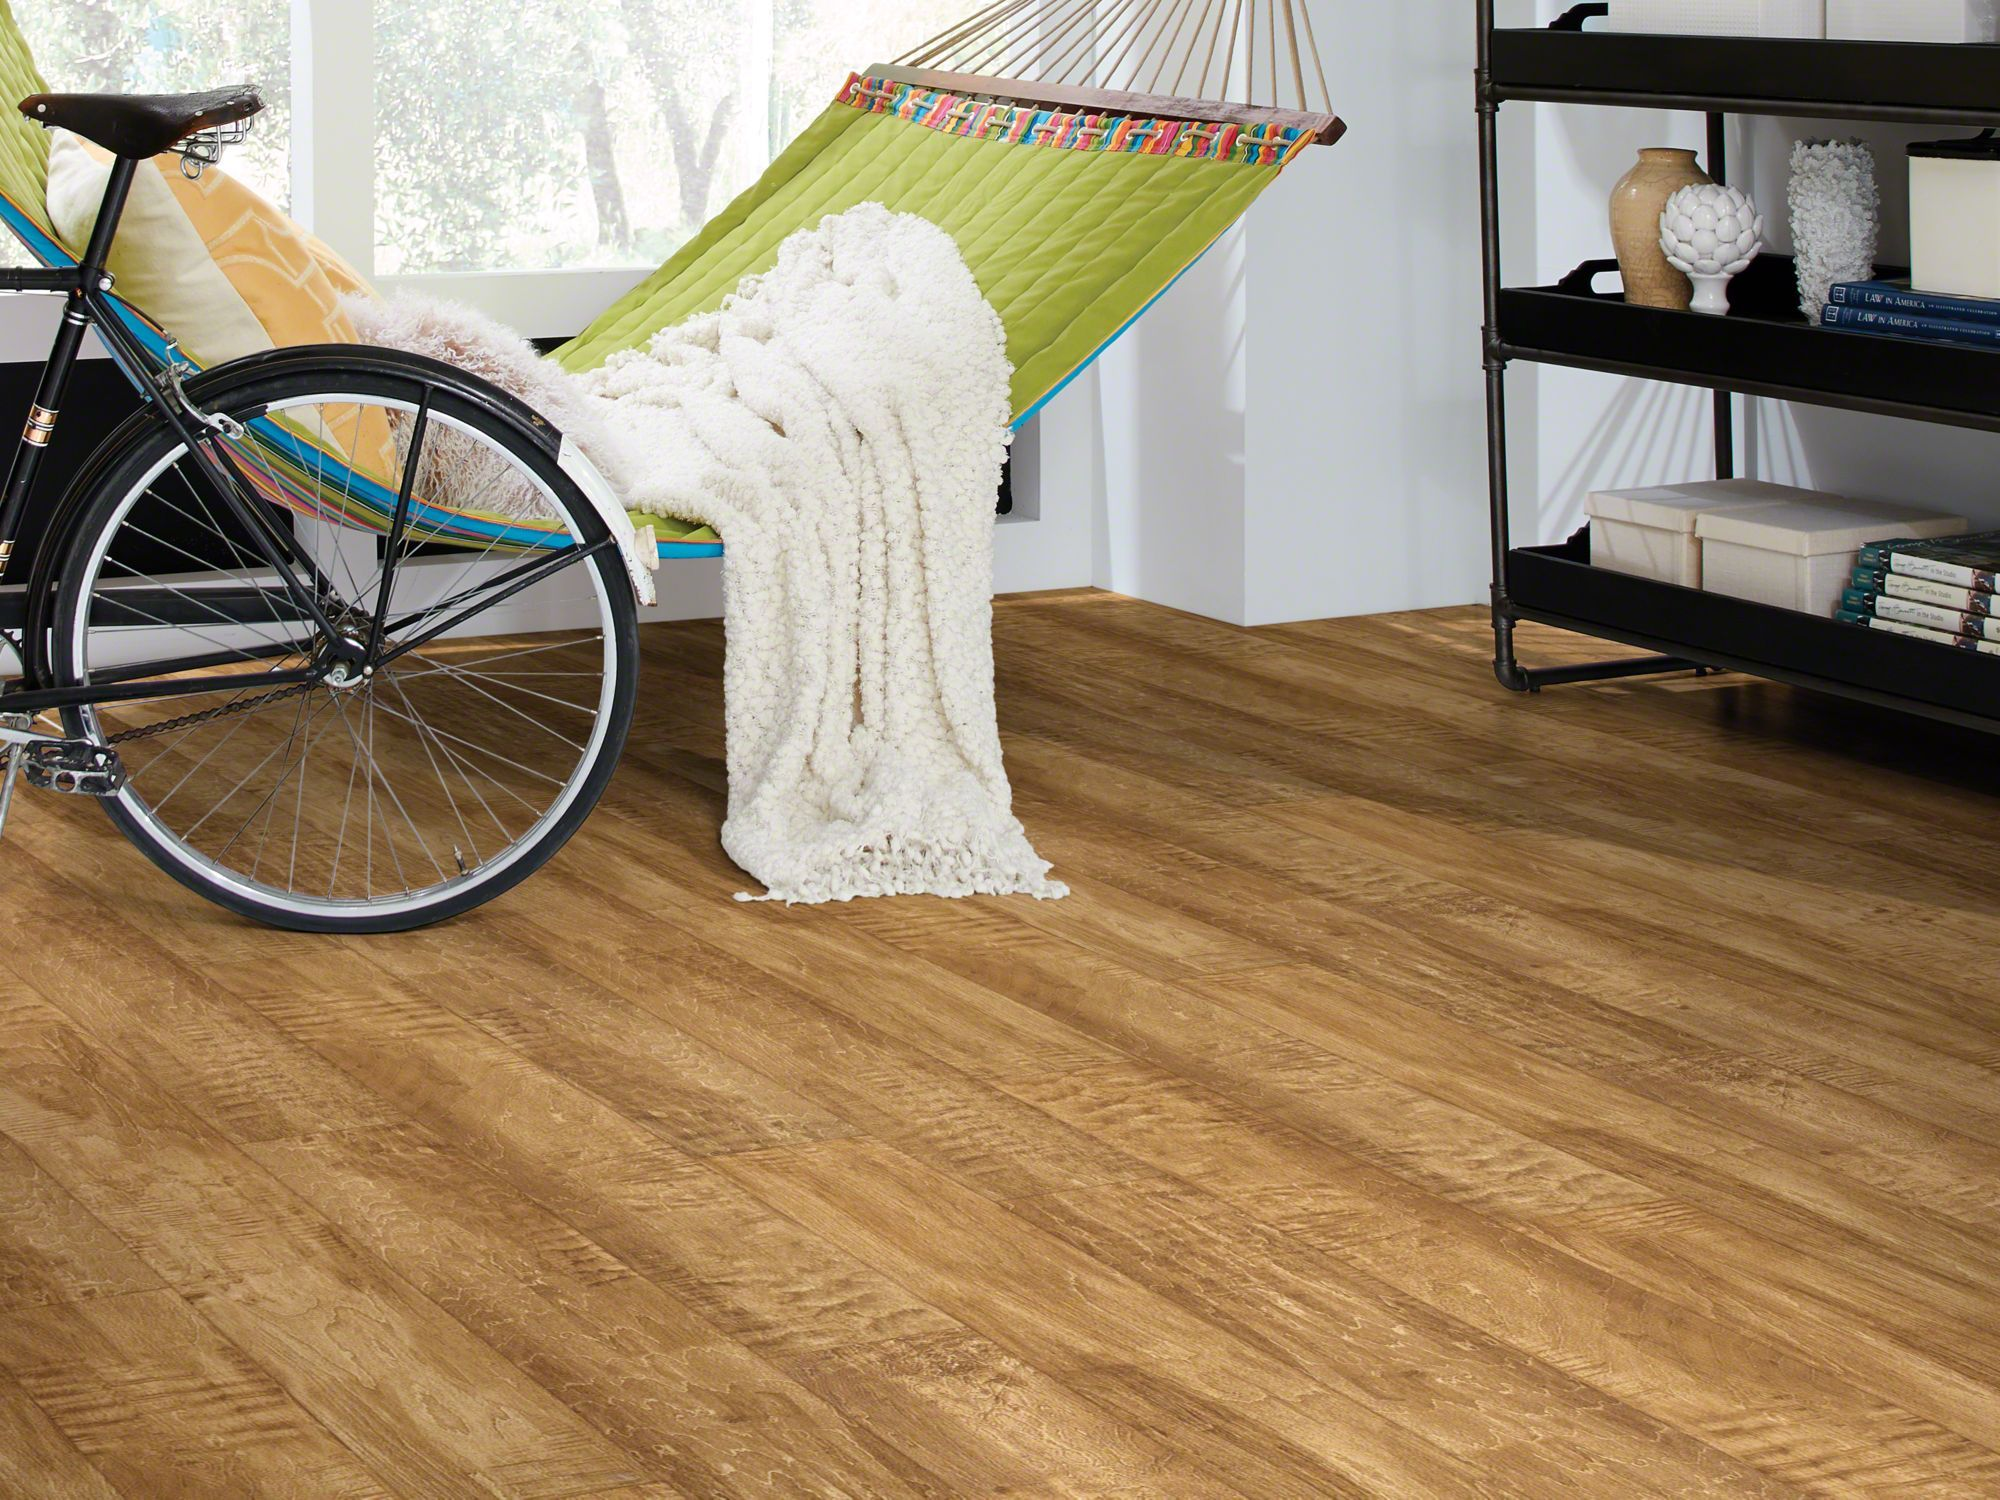 How to Clean Vinyl Flooring Vinyl plank, Luxury vinyl